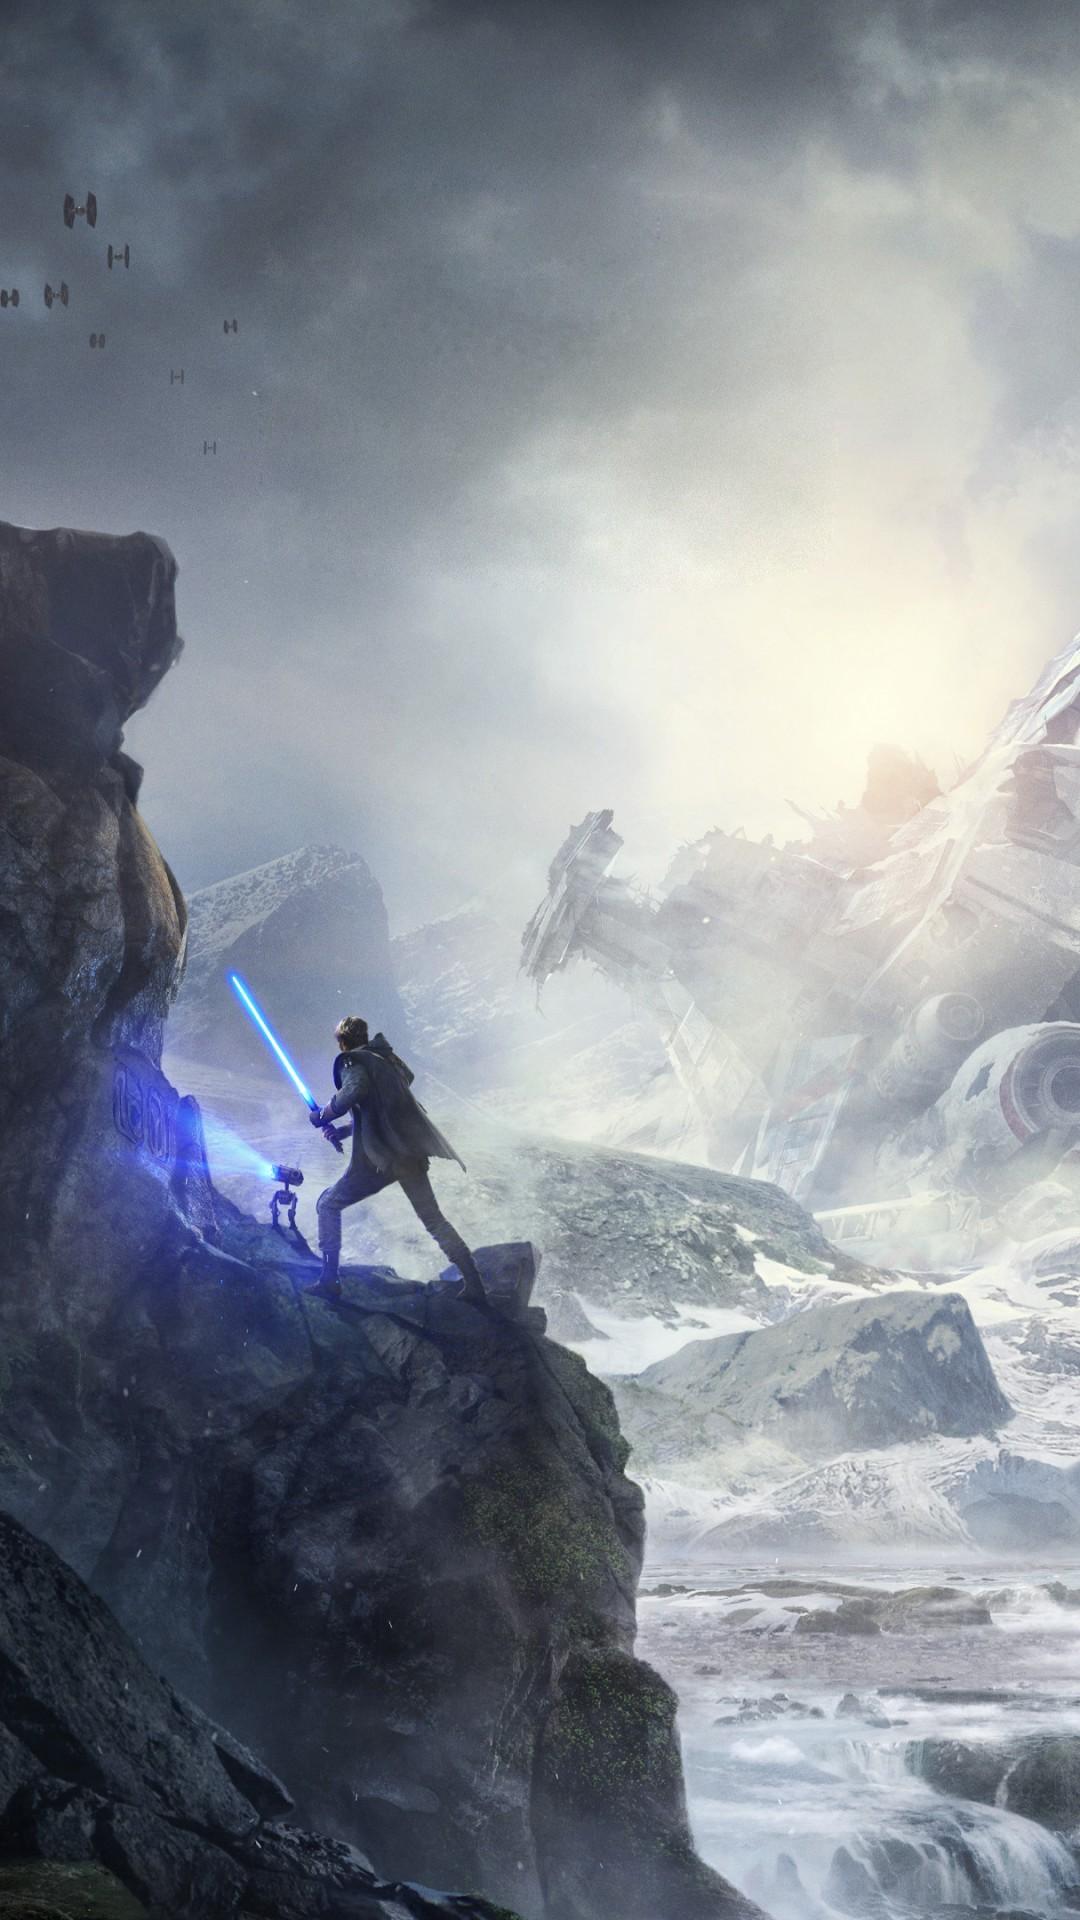 Wallpaper Star Wars Jedi Fallen Order Screenshot 4k